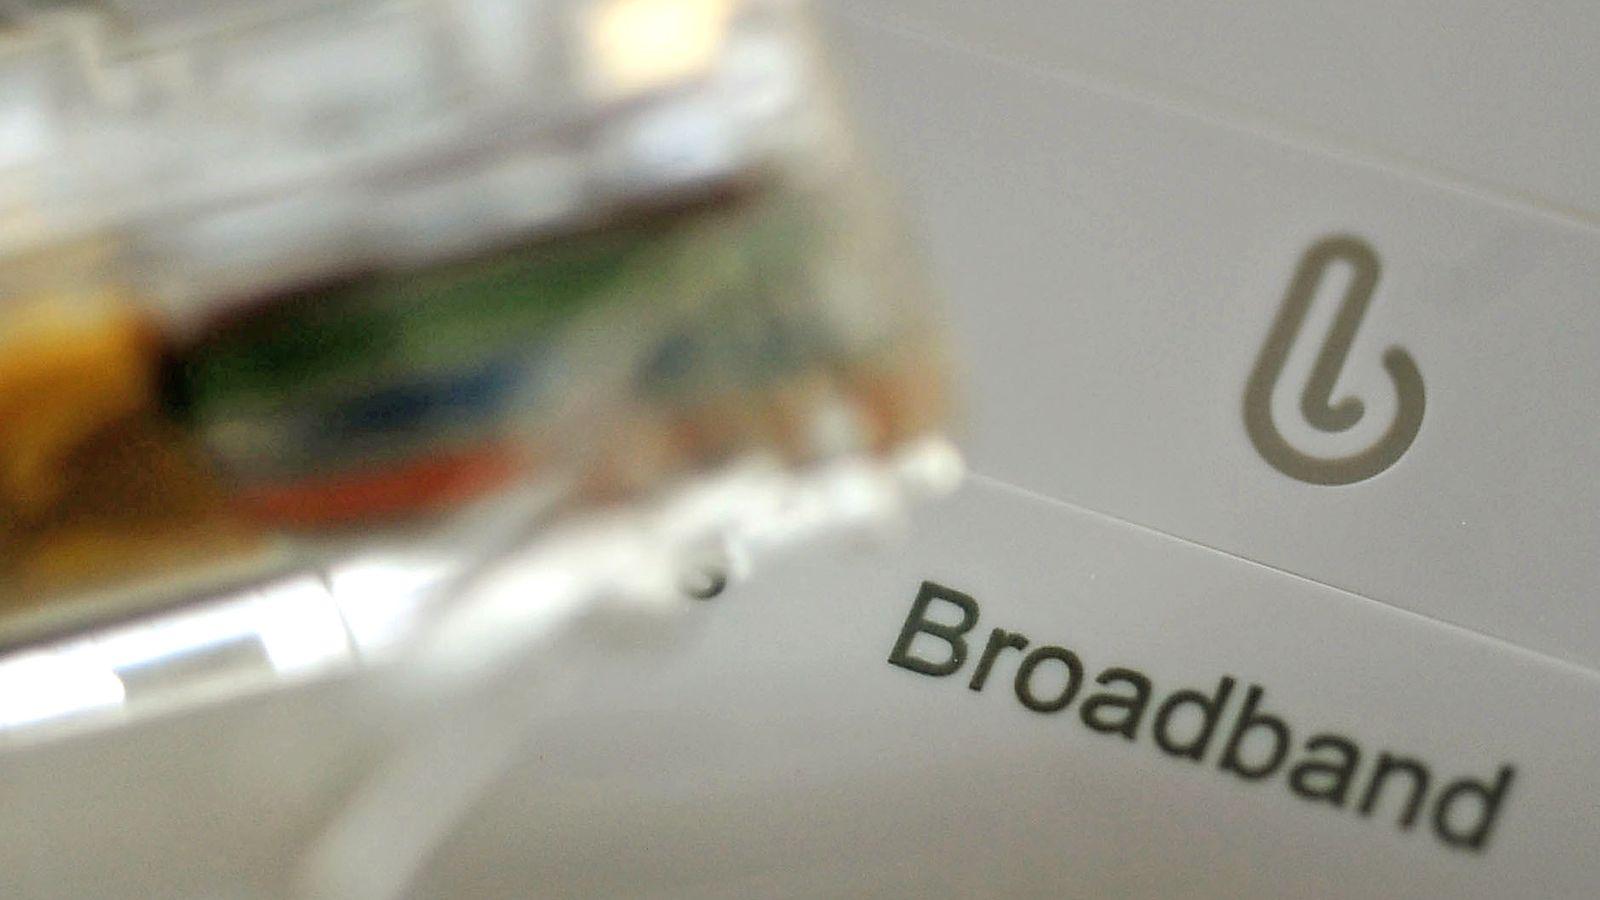 University lecturers' pension scheme USS plots broadband bid   Business News